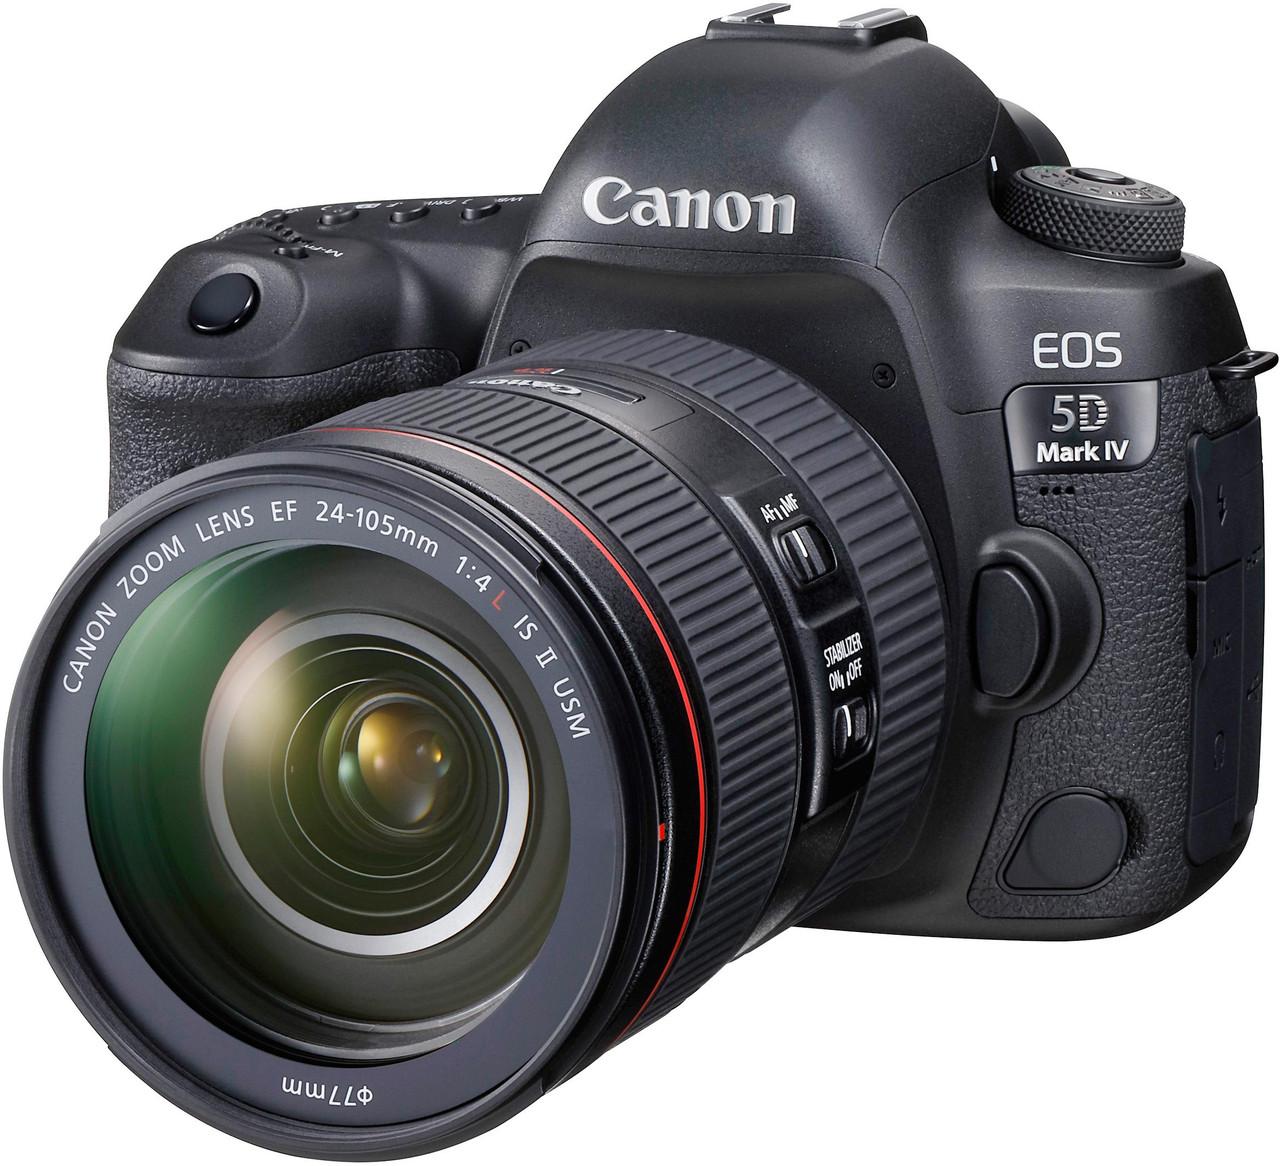 Canon EOS 5D Mark IV with EF 24-105mm F4L IS II USM Lens